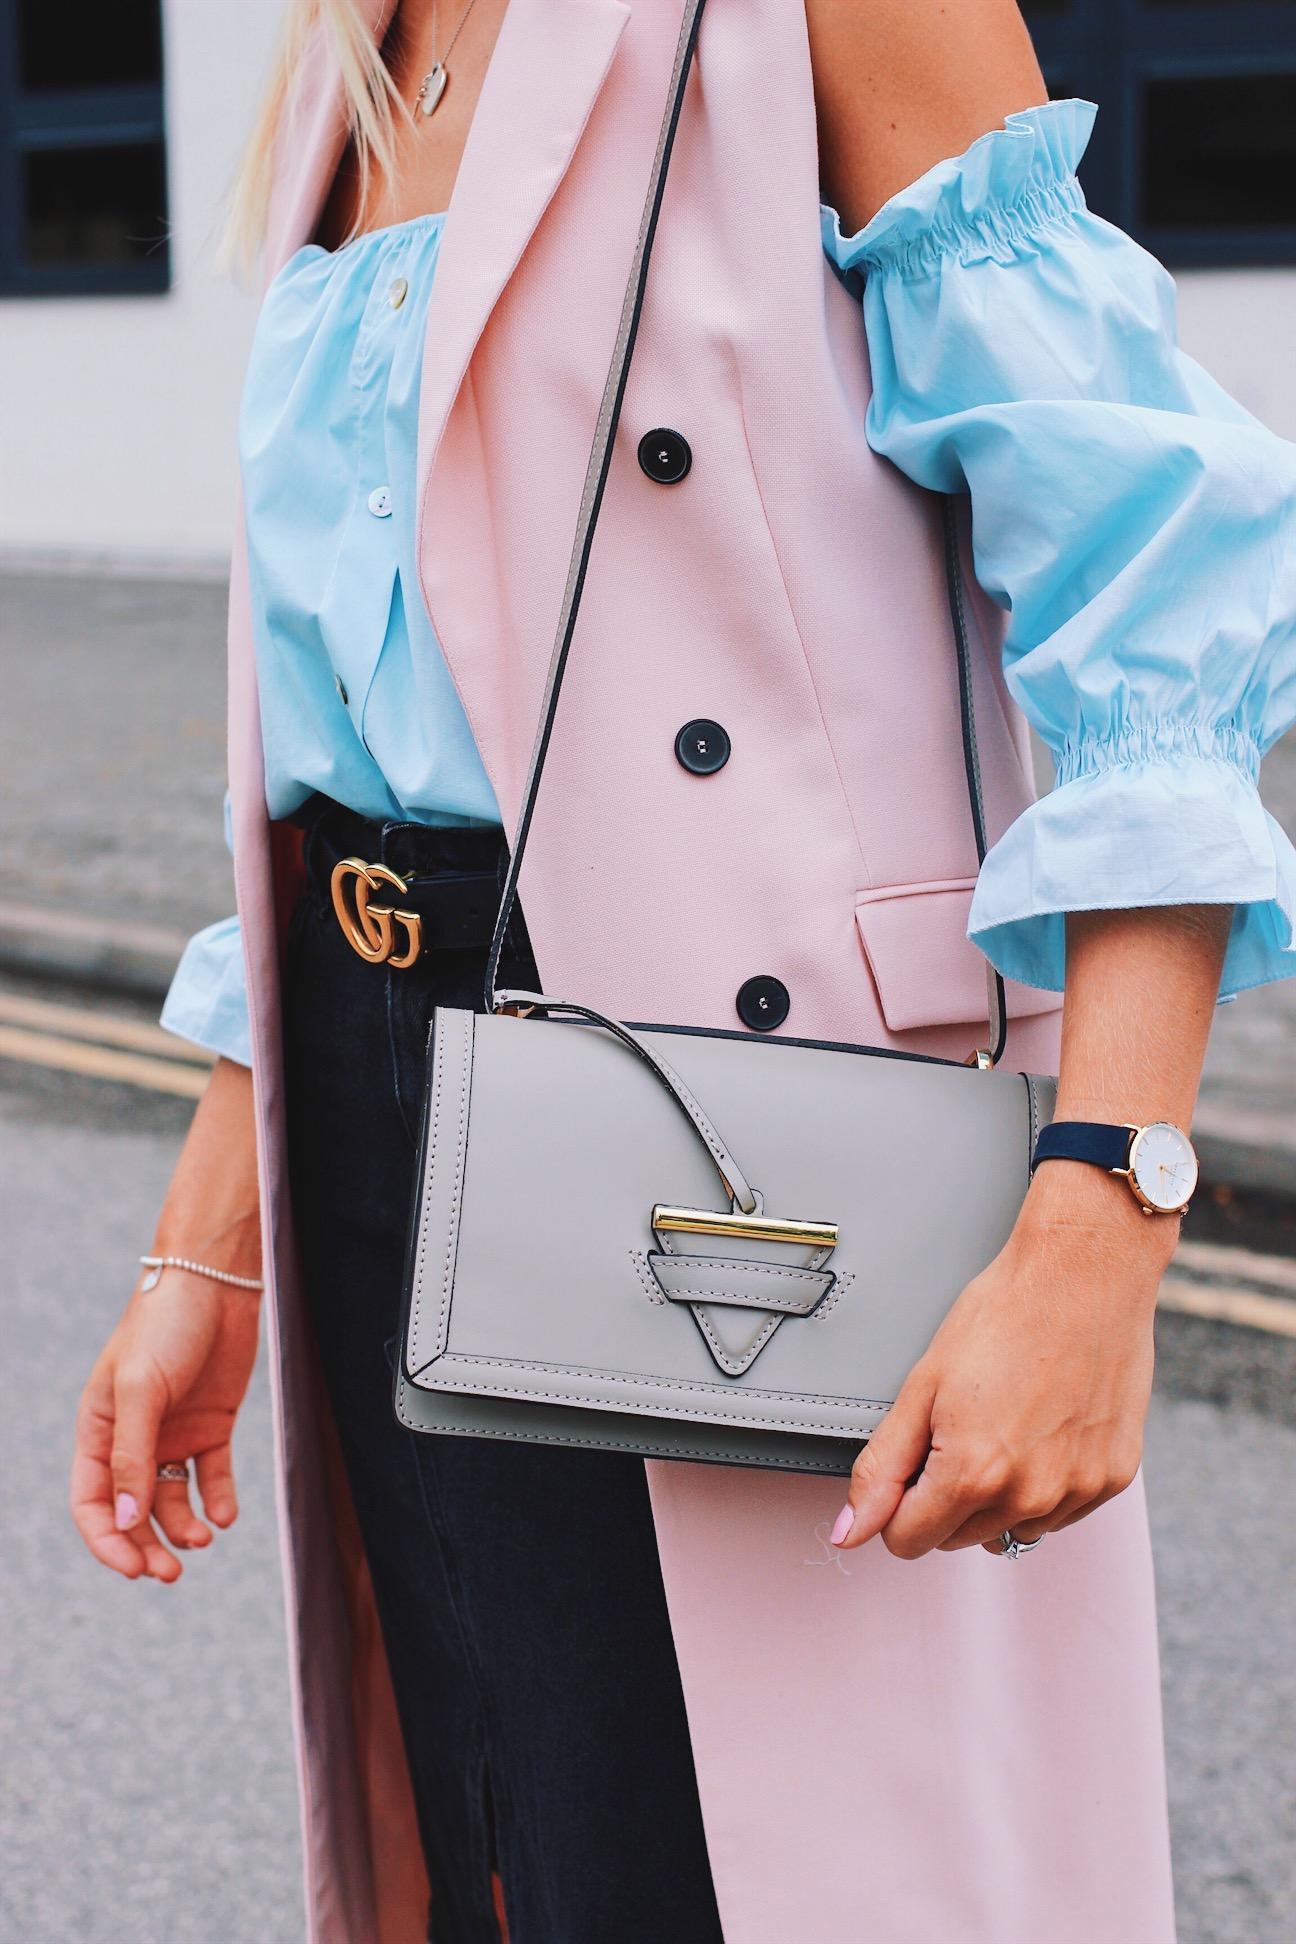 Camelia Roma Loewe Lookalike Handbag Pink Sleeveless blazer and tanned skin